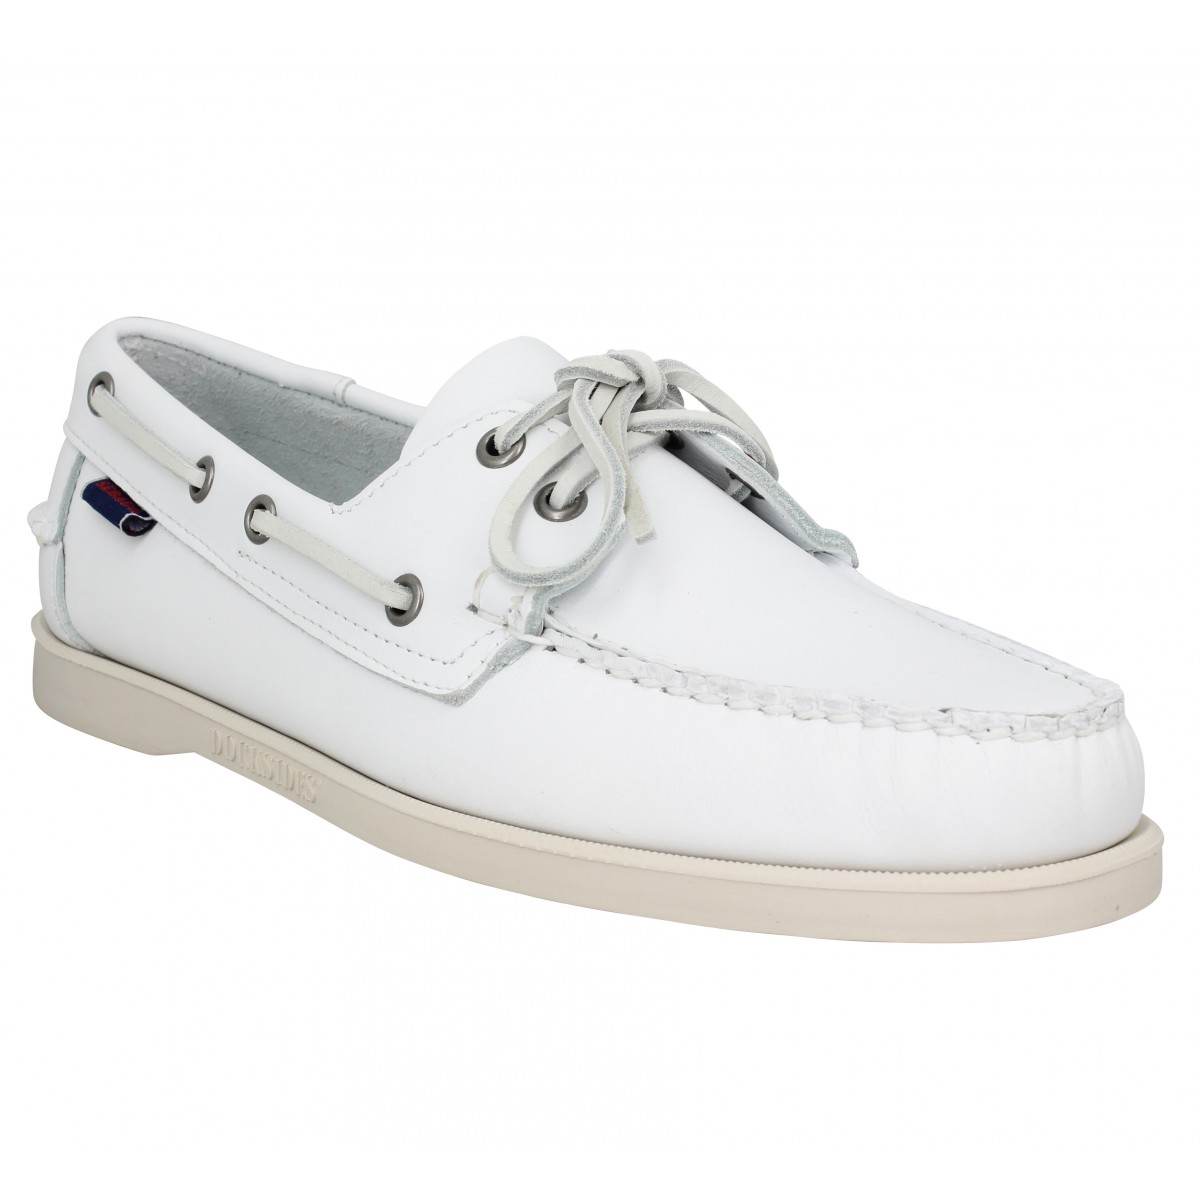 Chaussures bateaux SEBAGO Docksides Portland cuir Homme Blanc